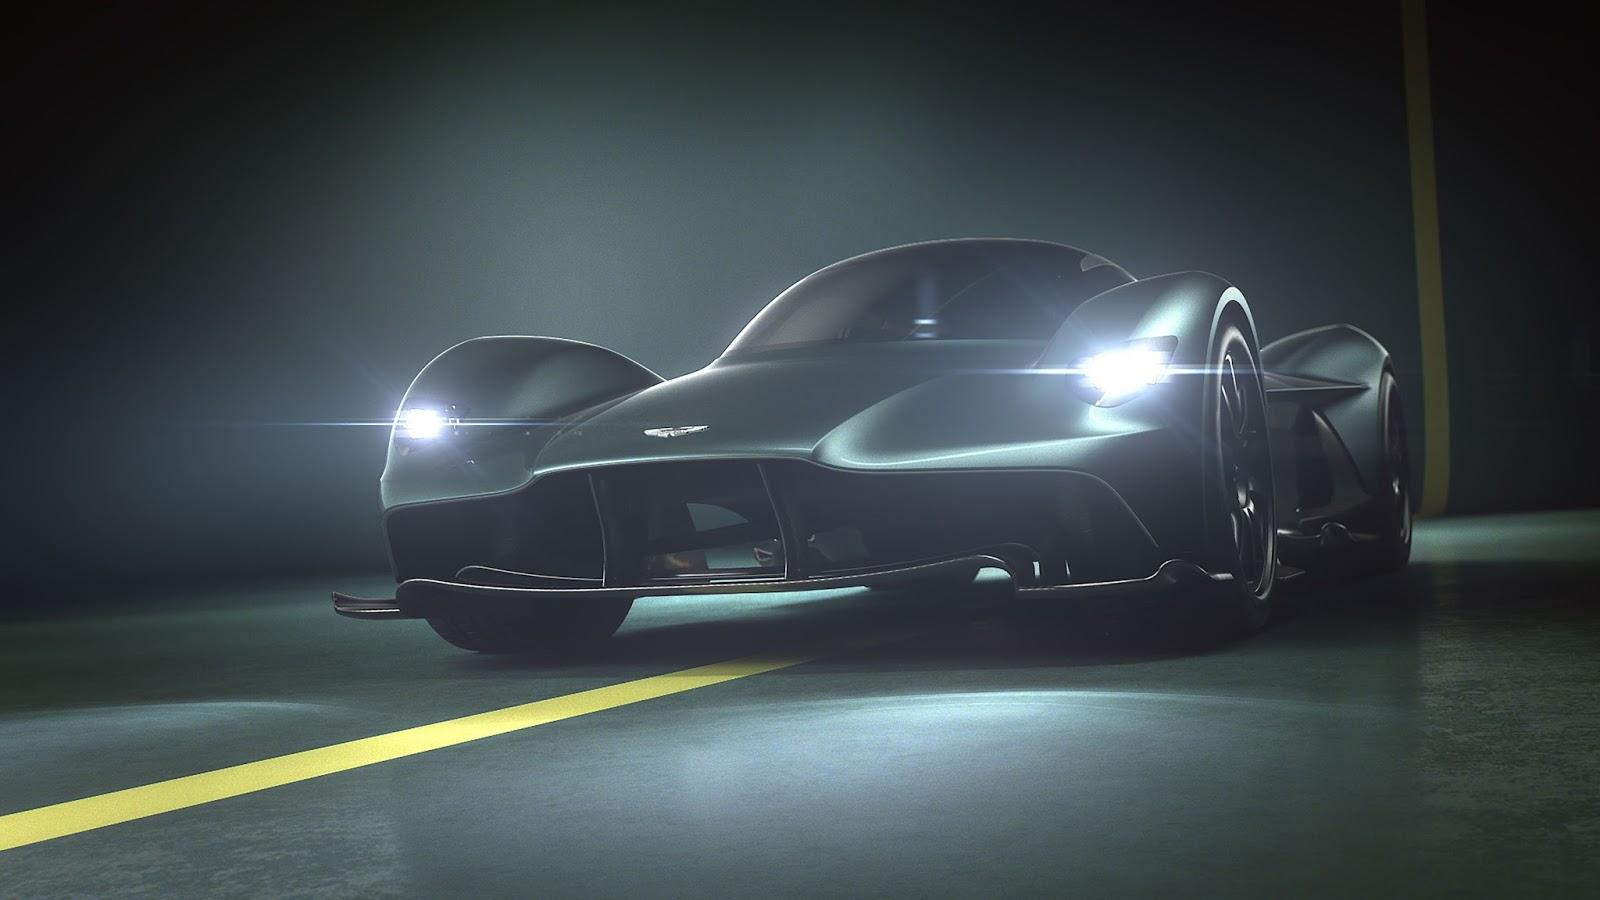 aston martin valkyrie01 Γνώρισε τη Θεά Aston Martin Valkyrie! Aston Martin, Aston Martin Valkyrie, Hybrid, hypercar, Limited edition, Red Bull, supercars